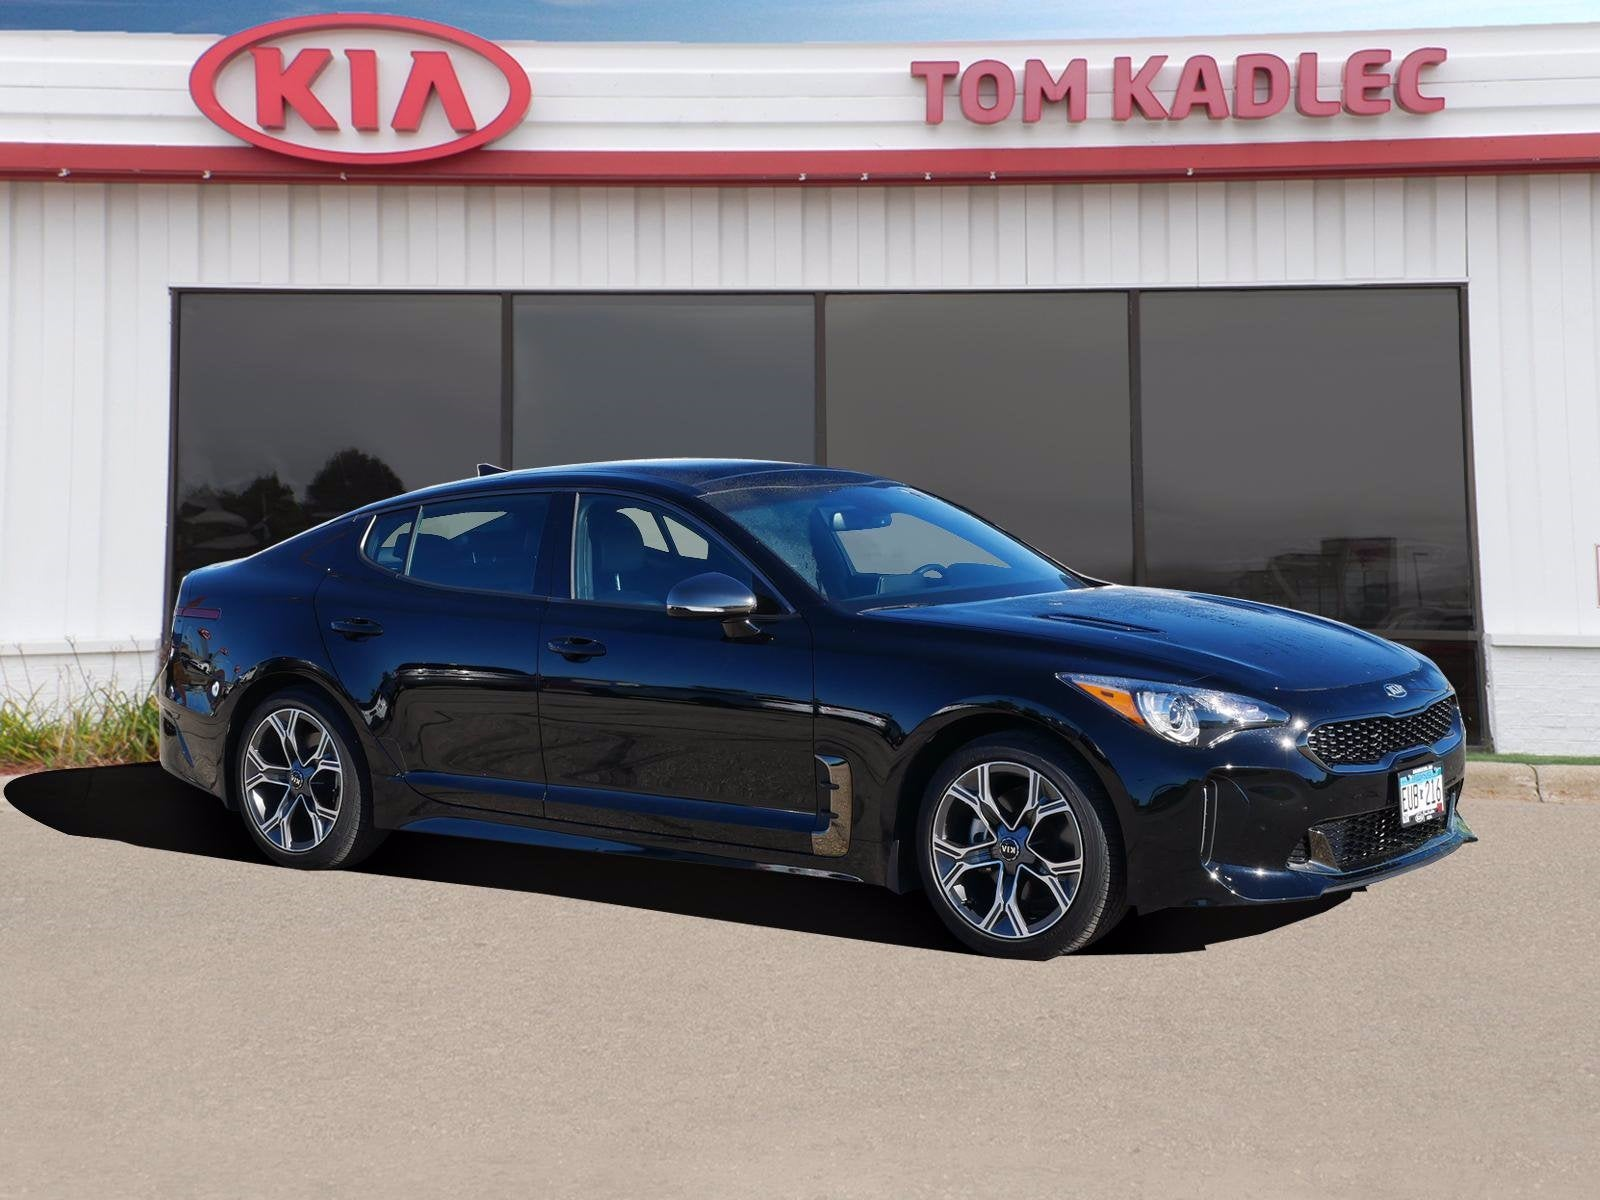 Certified 2020 Kia Stinger GT-Line with VIN KNAE15LA2L6083031 for sale in Rochester, Minnesota